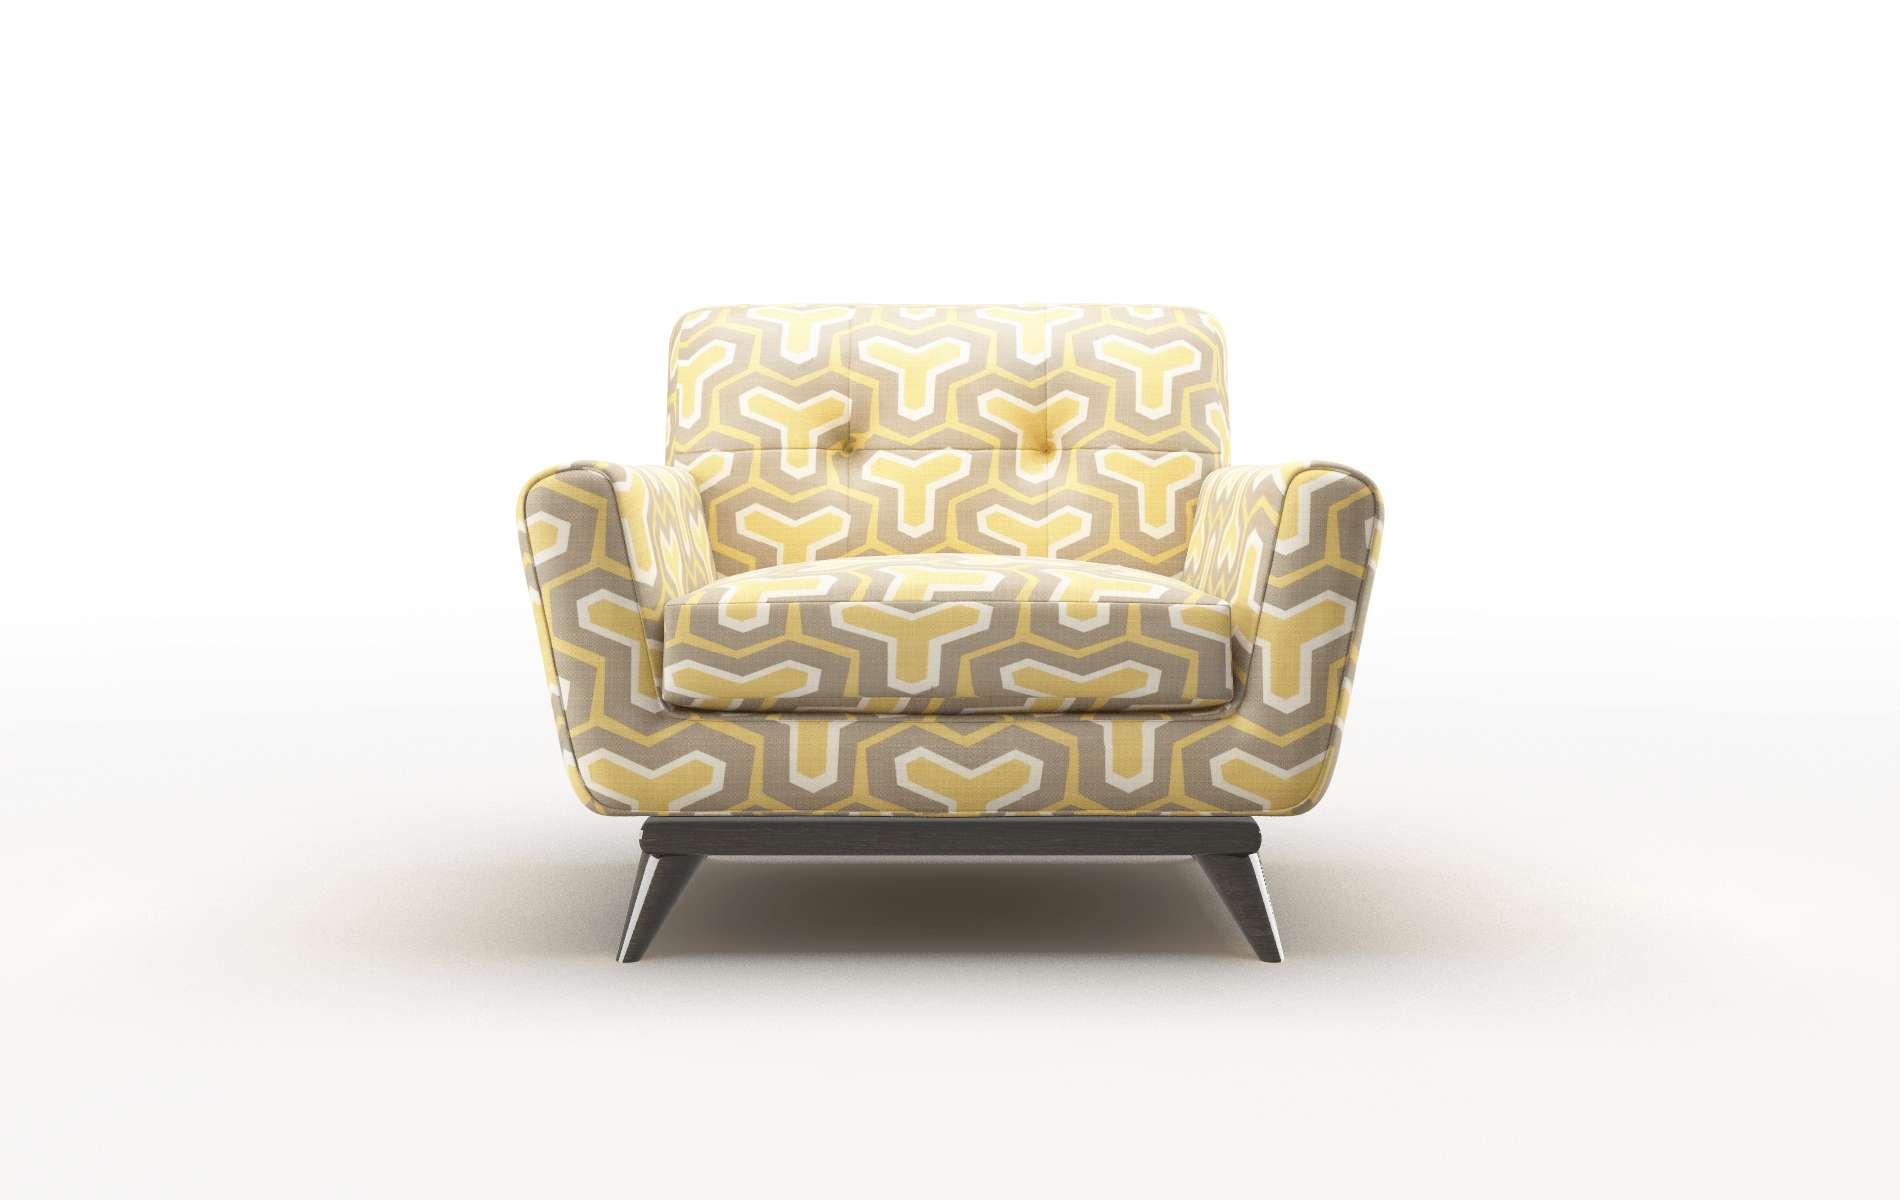 Brussels Merci Dijon Chair espresso legs 1